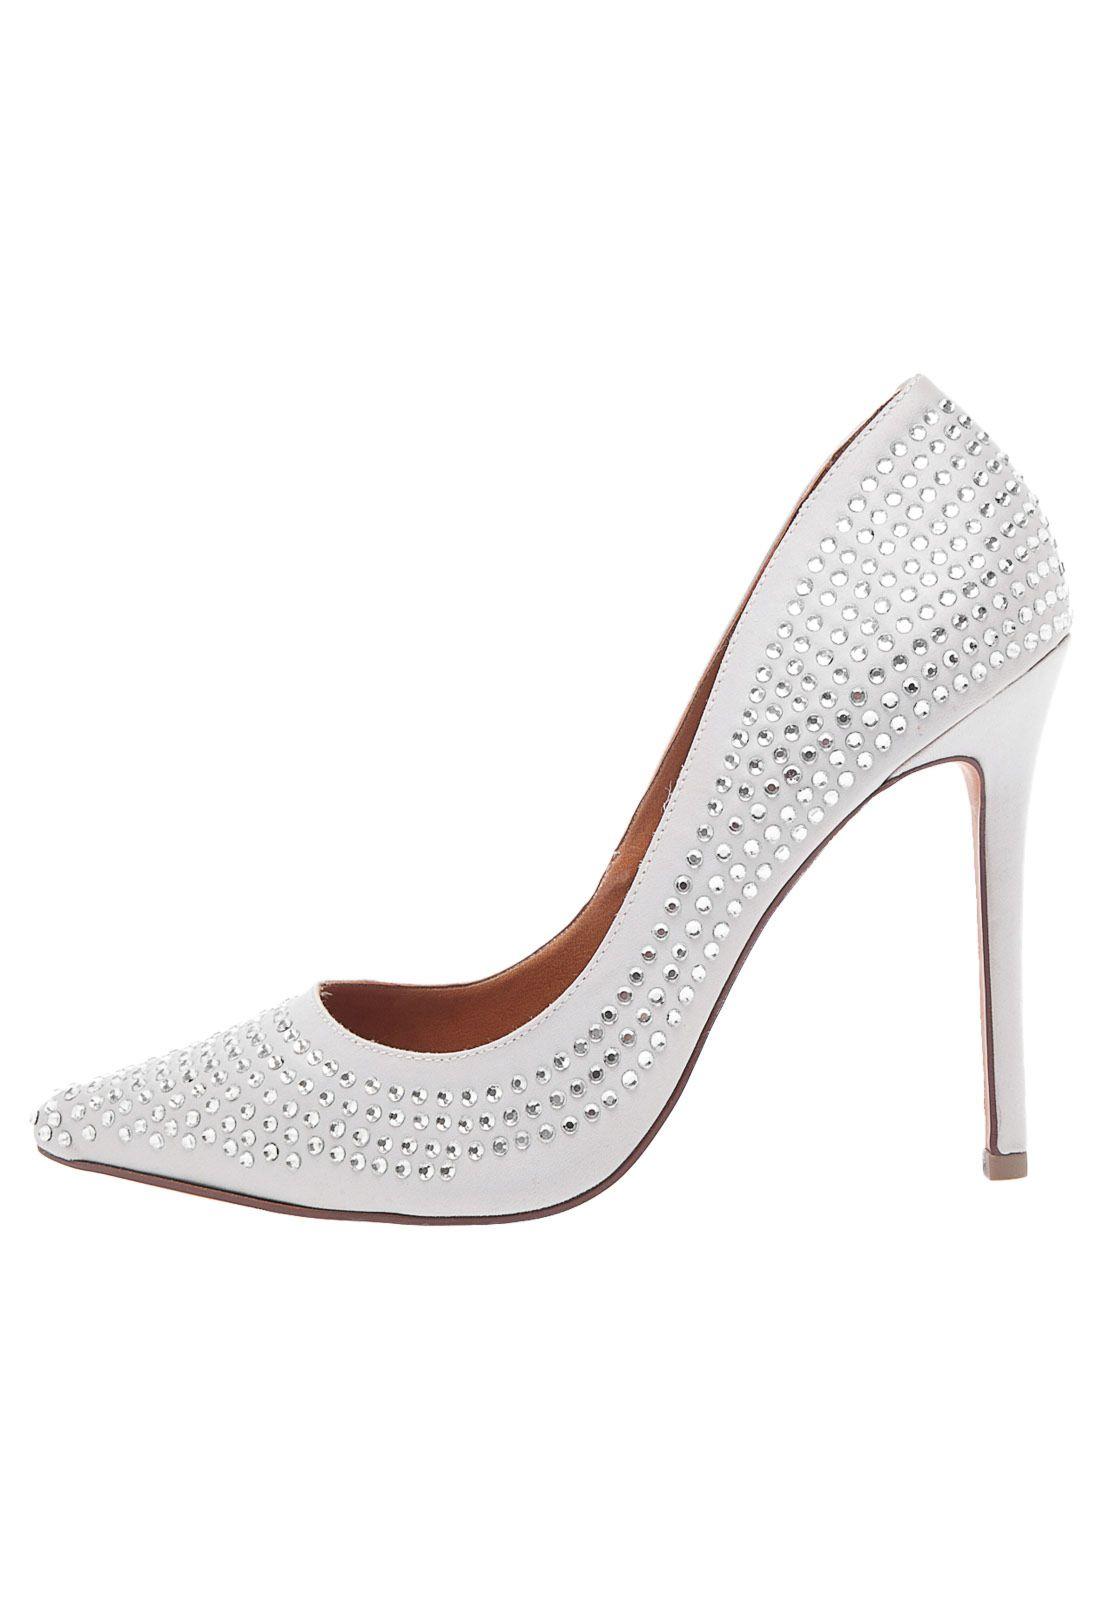 993187ca4 Scarpin Santa Lolla Strass Off   sapatos   Shoes, Off white e ...